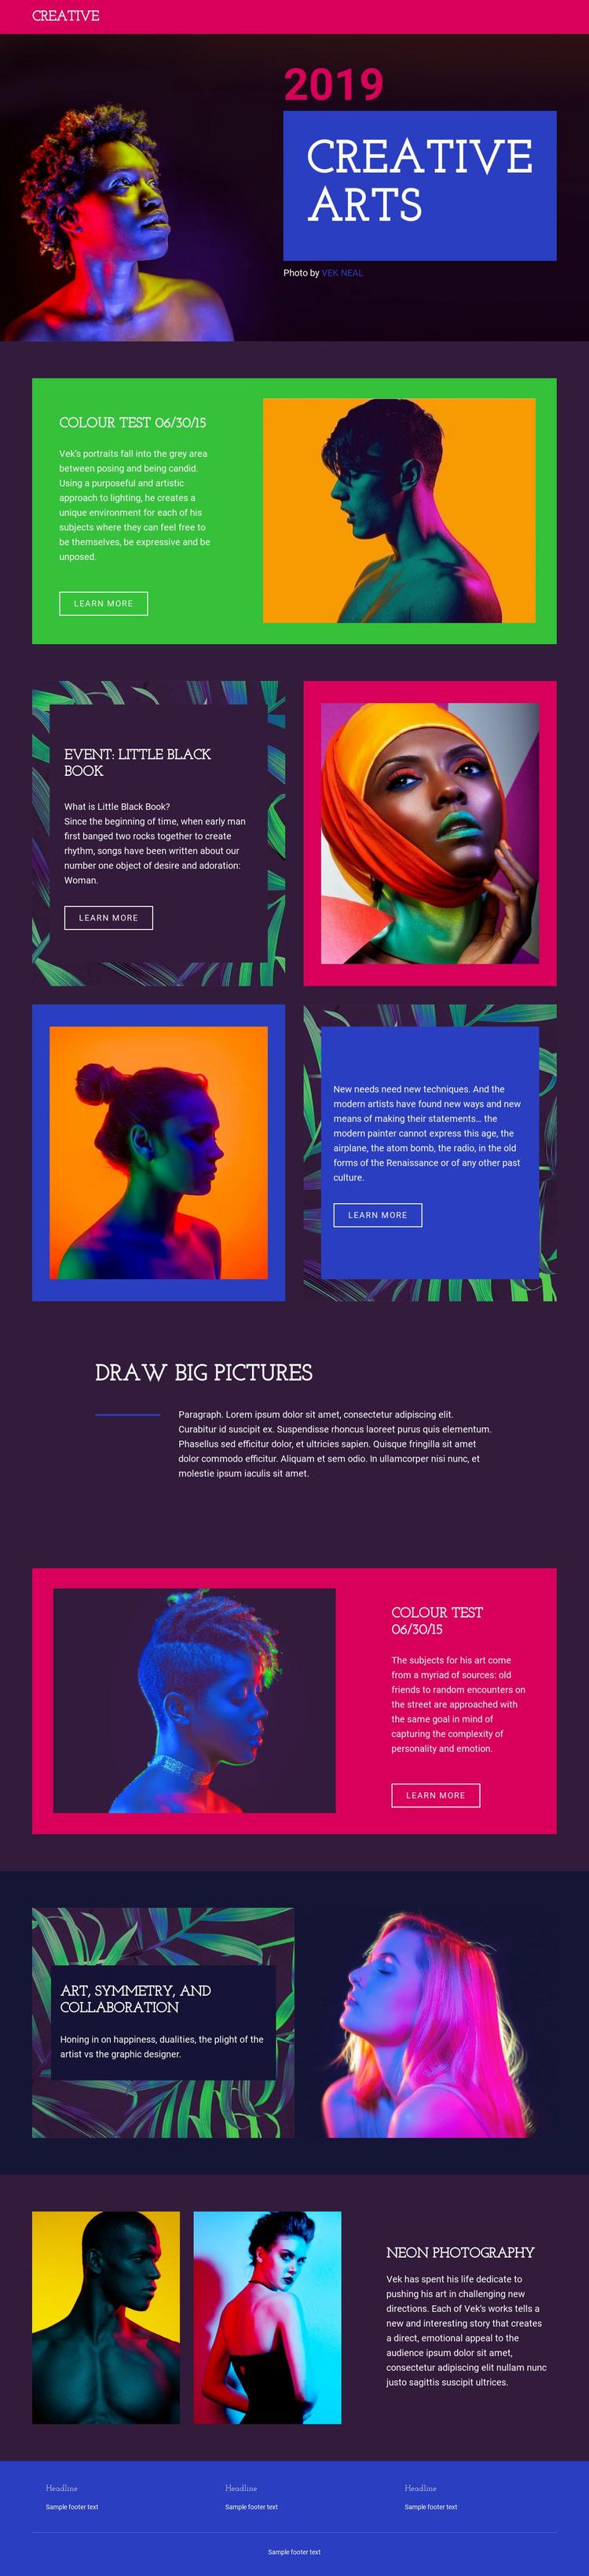 Creative Arts Web Design